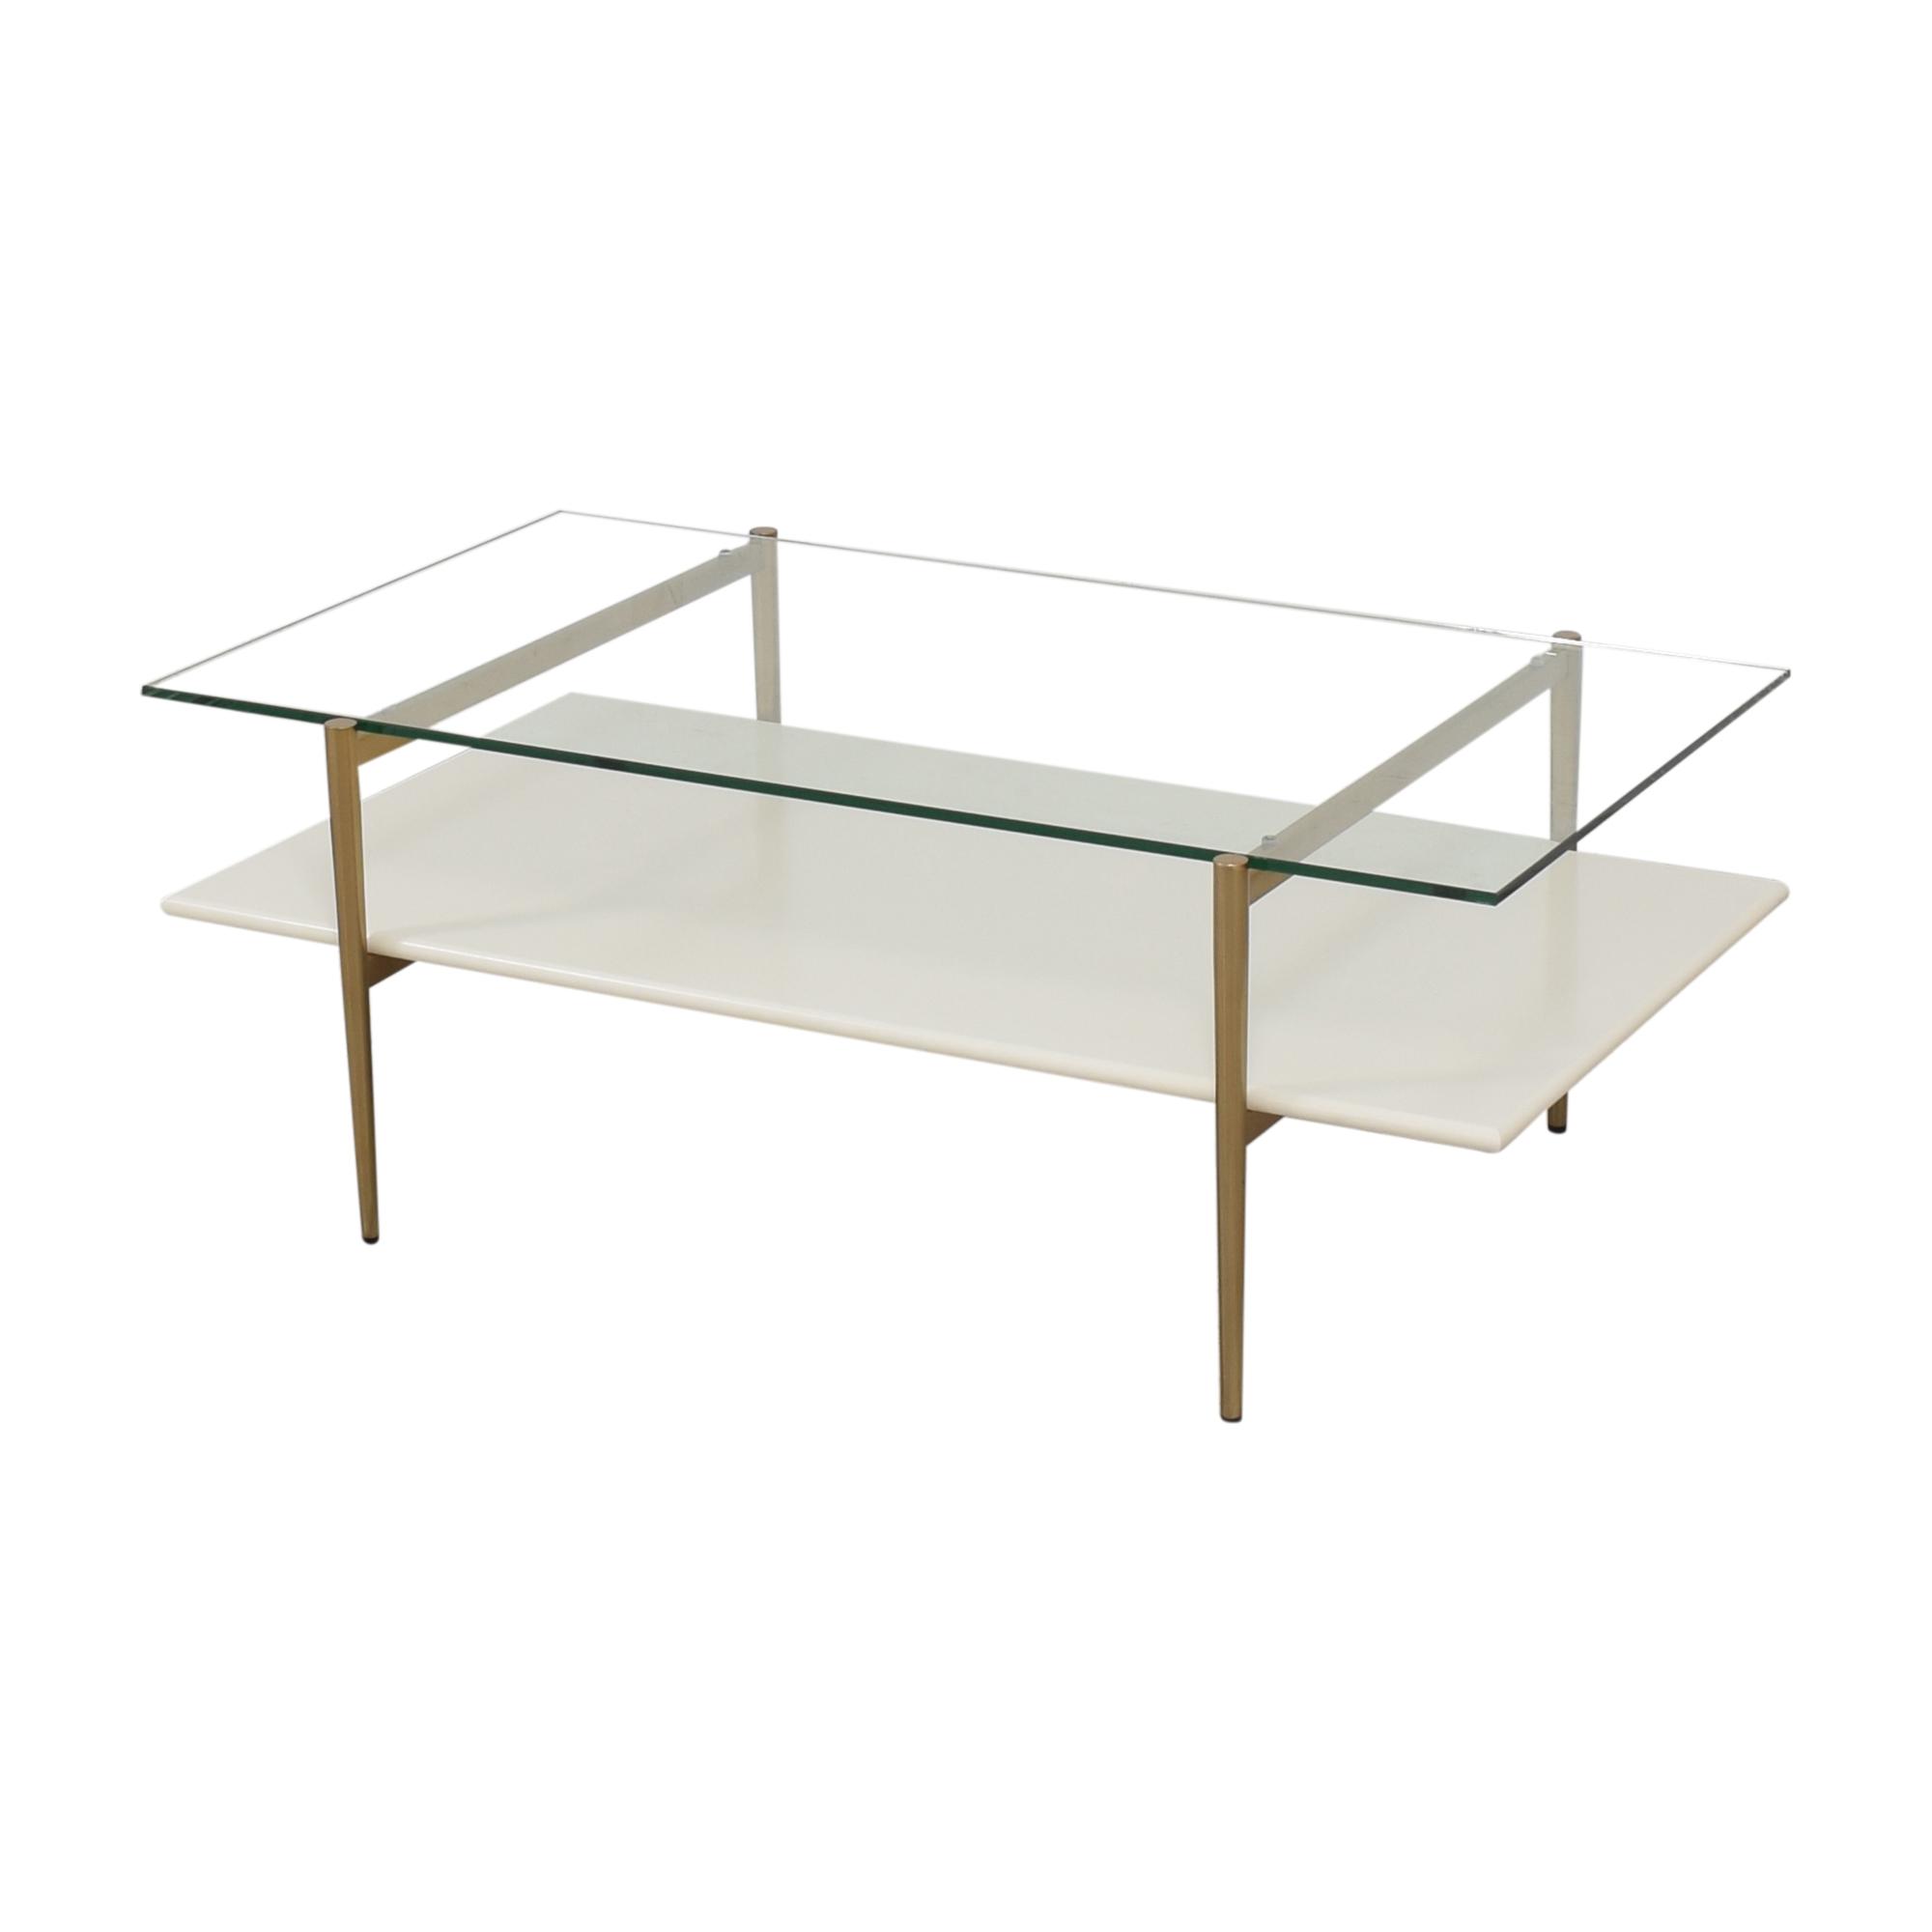 West Elm Mid Century Art Display Coffee Table / Coffee Tables